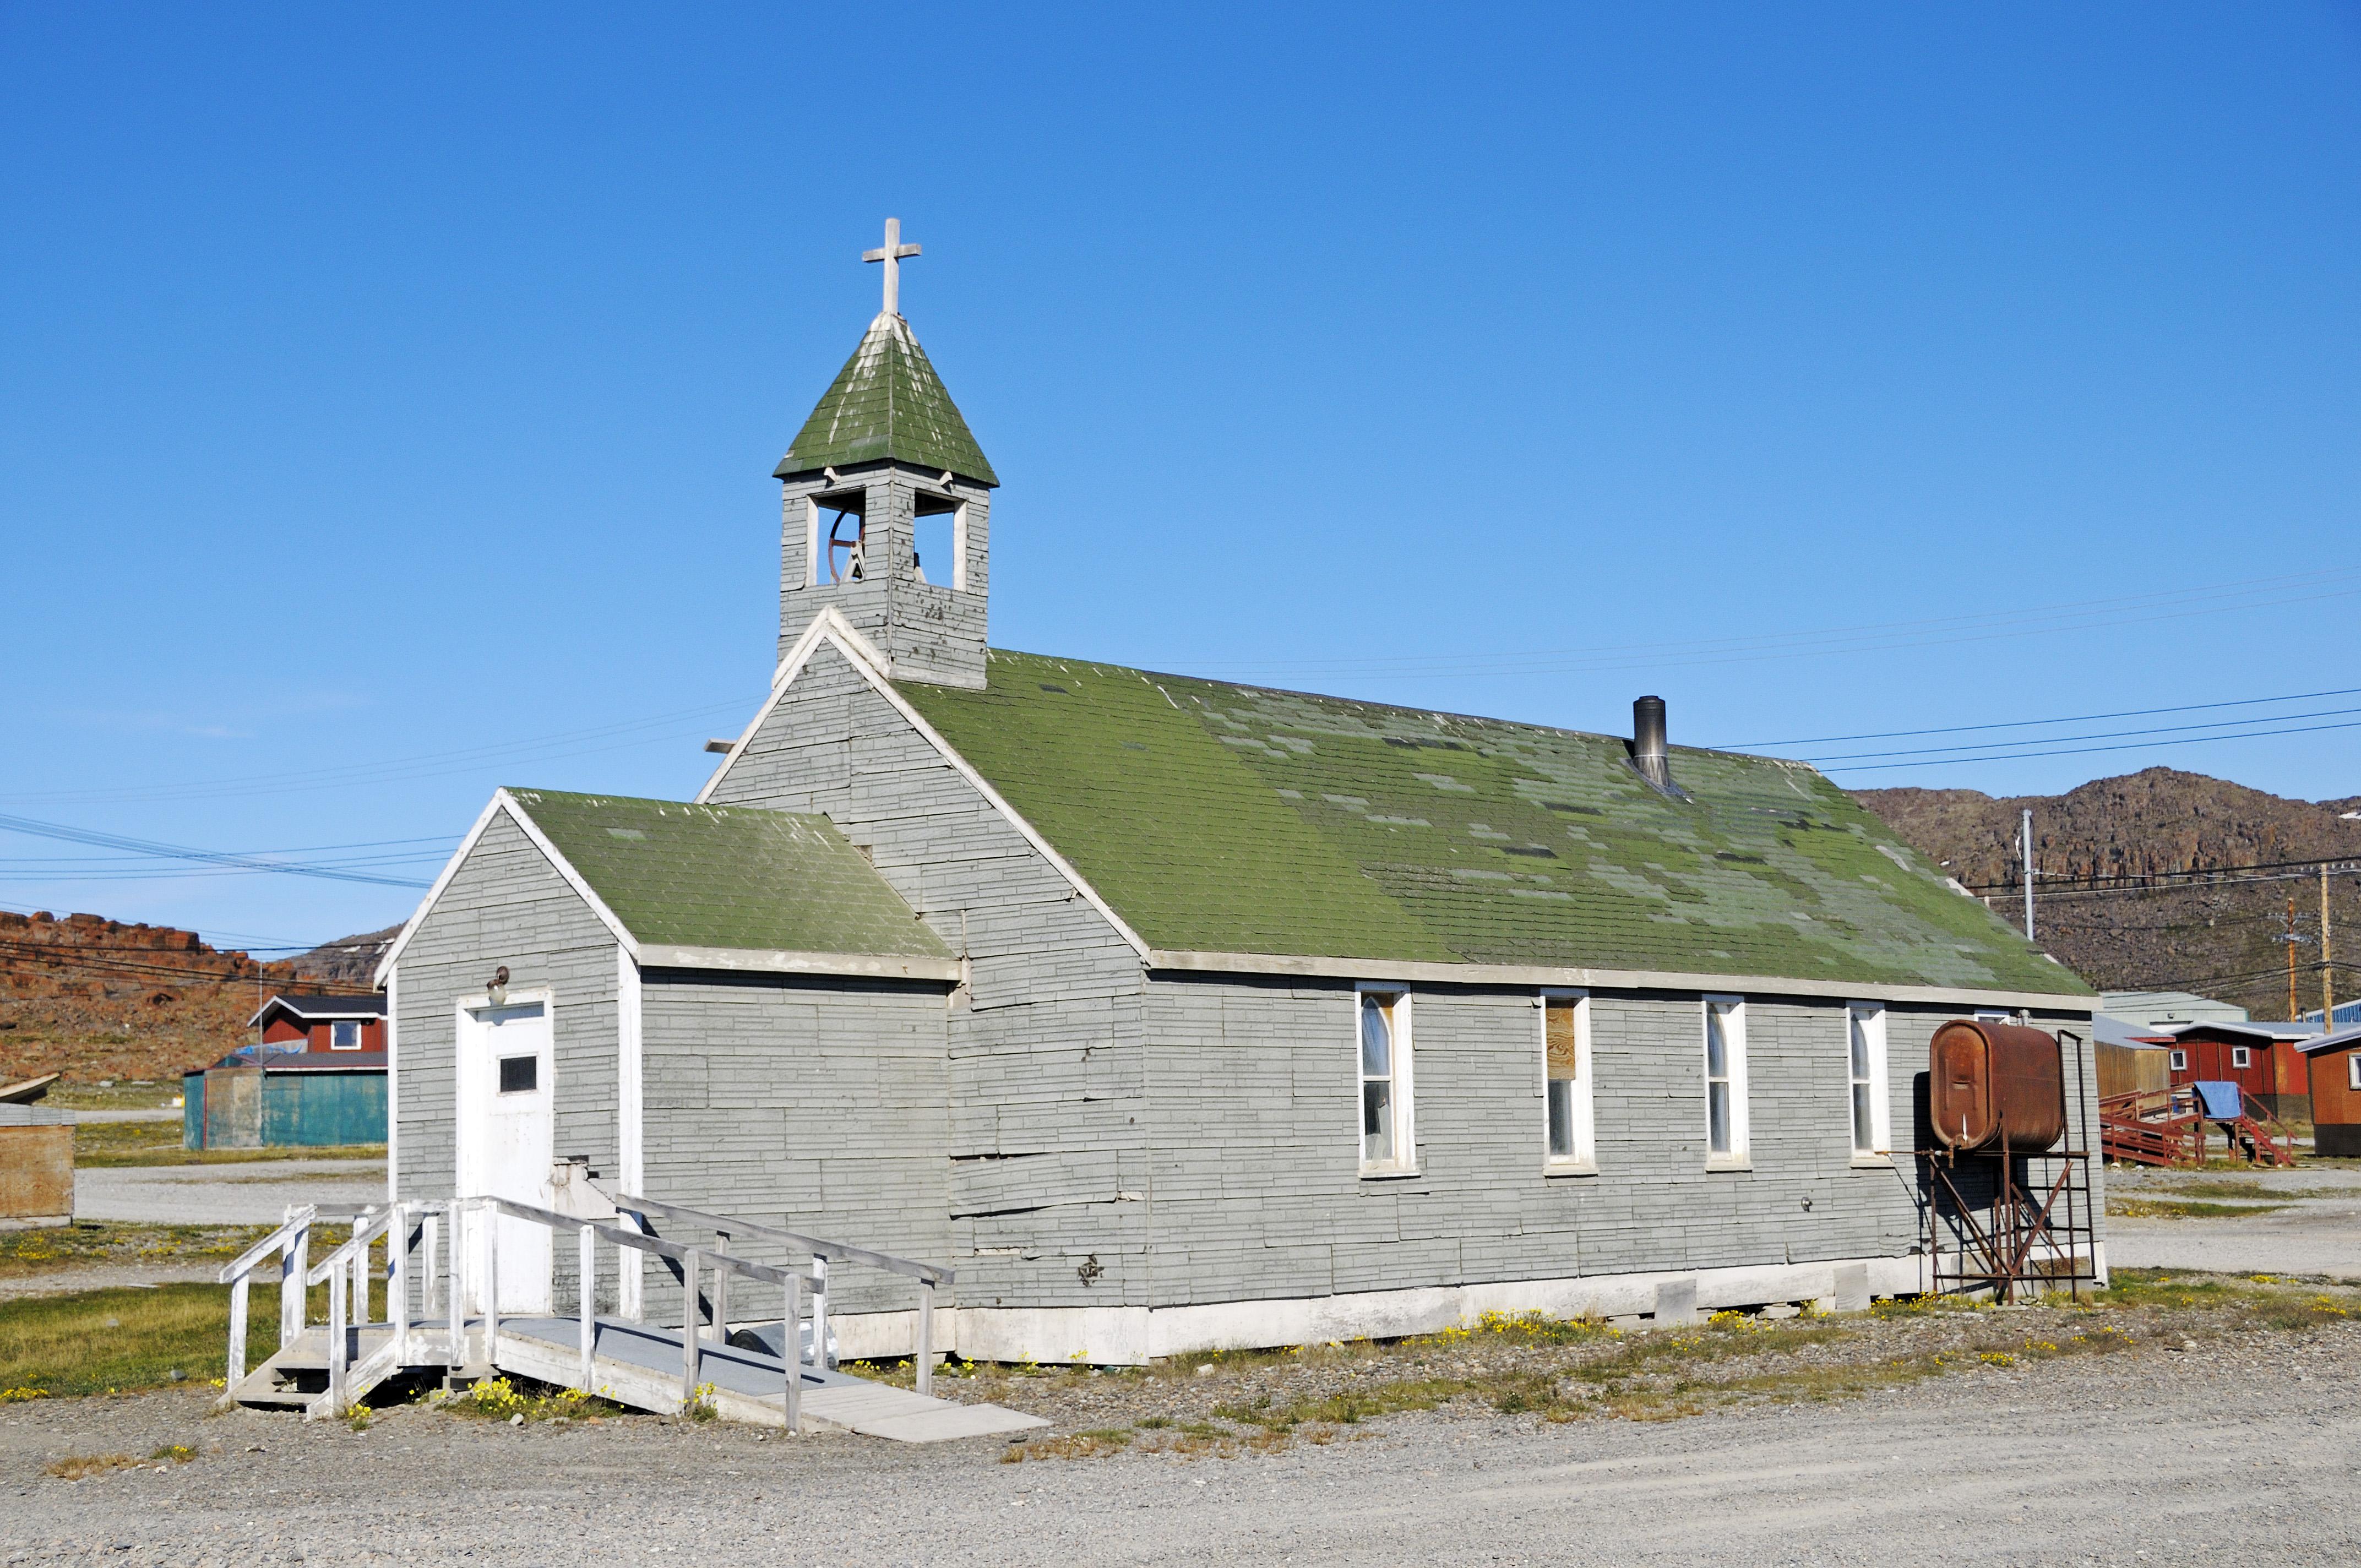 Kirche im Dorf Ulukhaktok, Victoria Island (vorher Holman Island), Northwest Territories, Kanada, Amerika